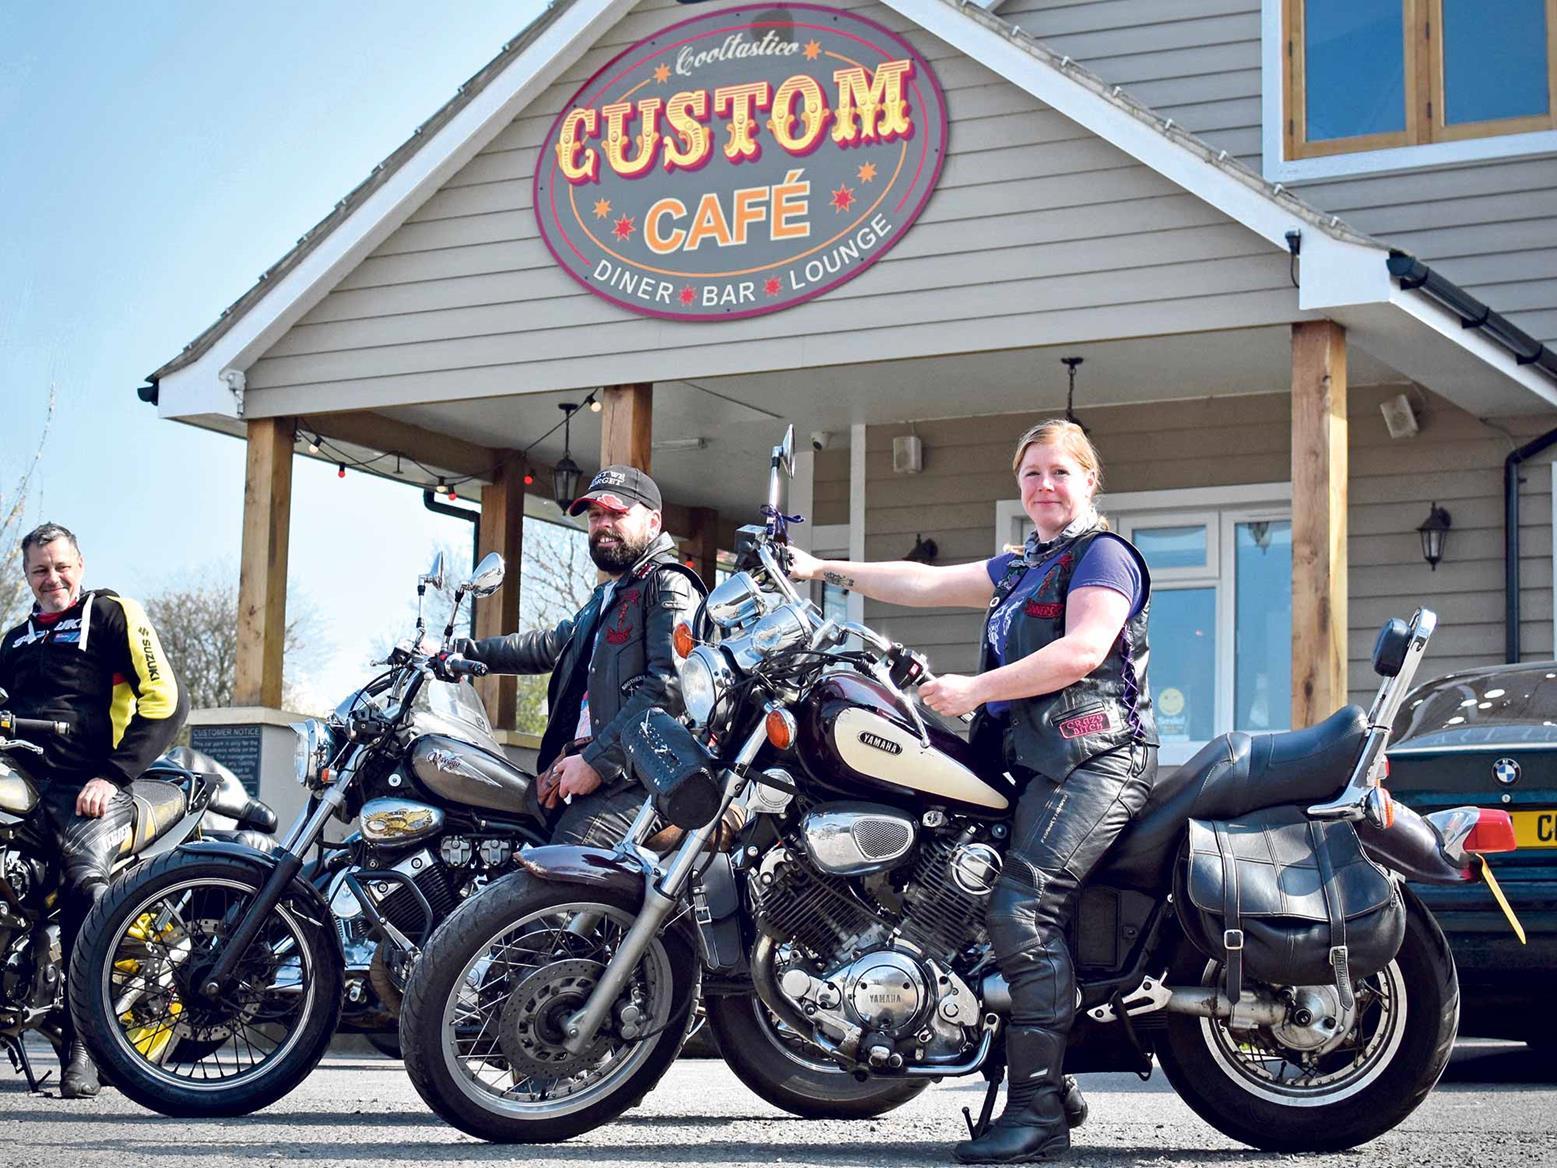 Regulars at The Custom Café